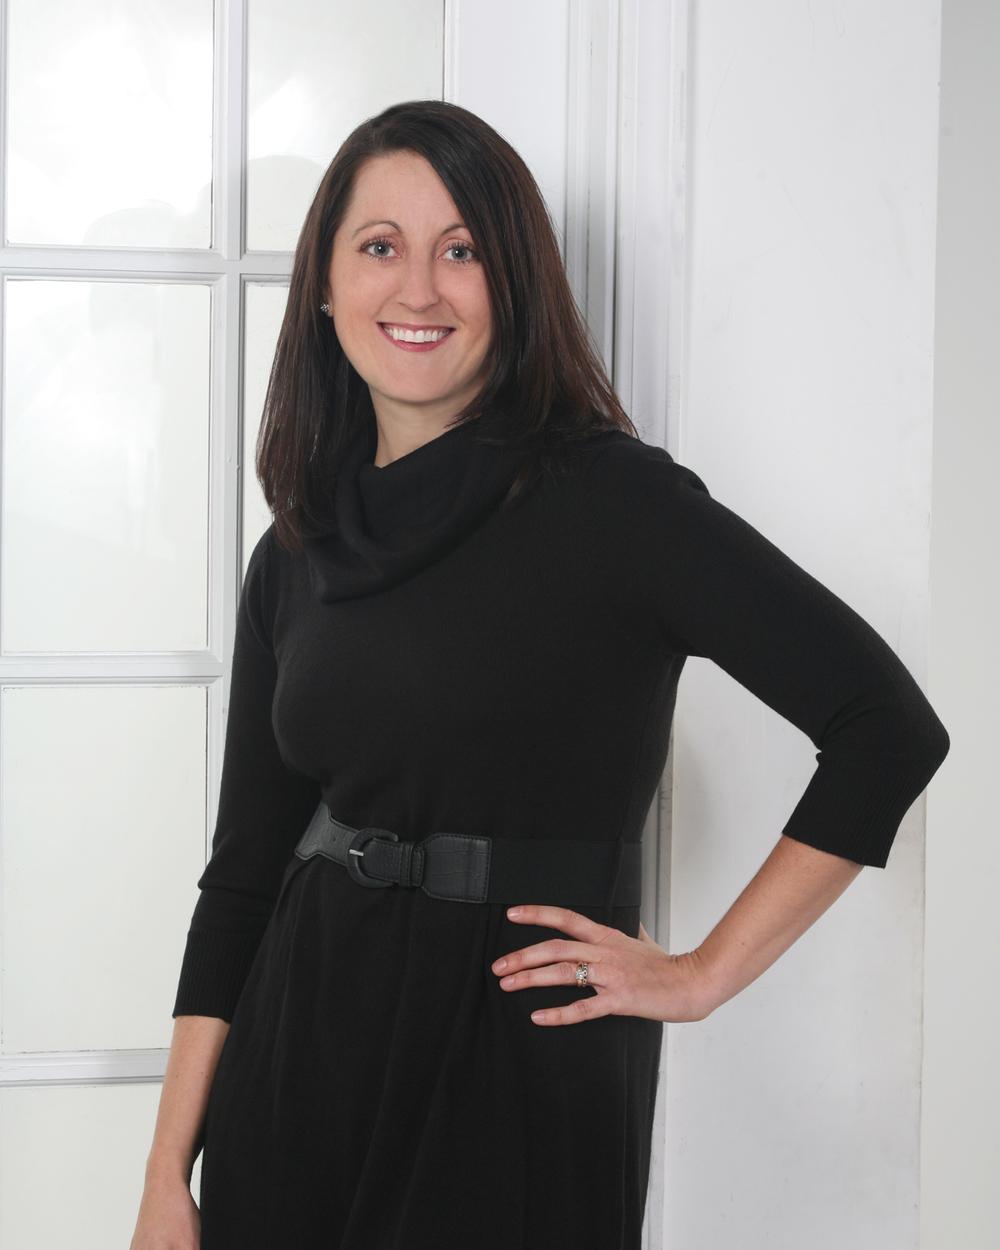 Amanda Ruhland